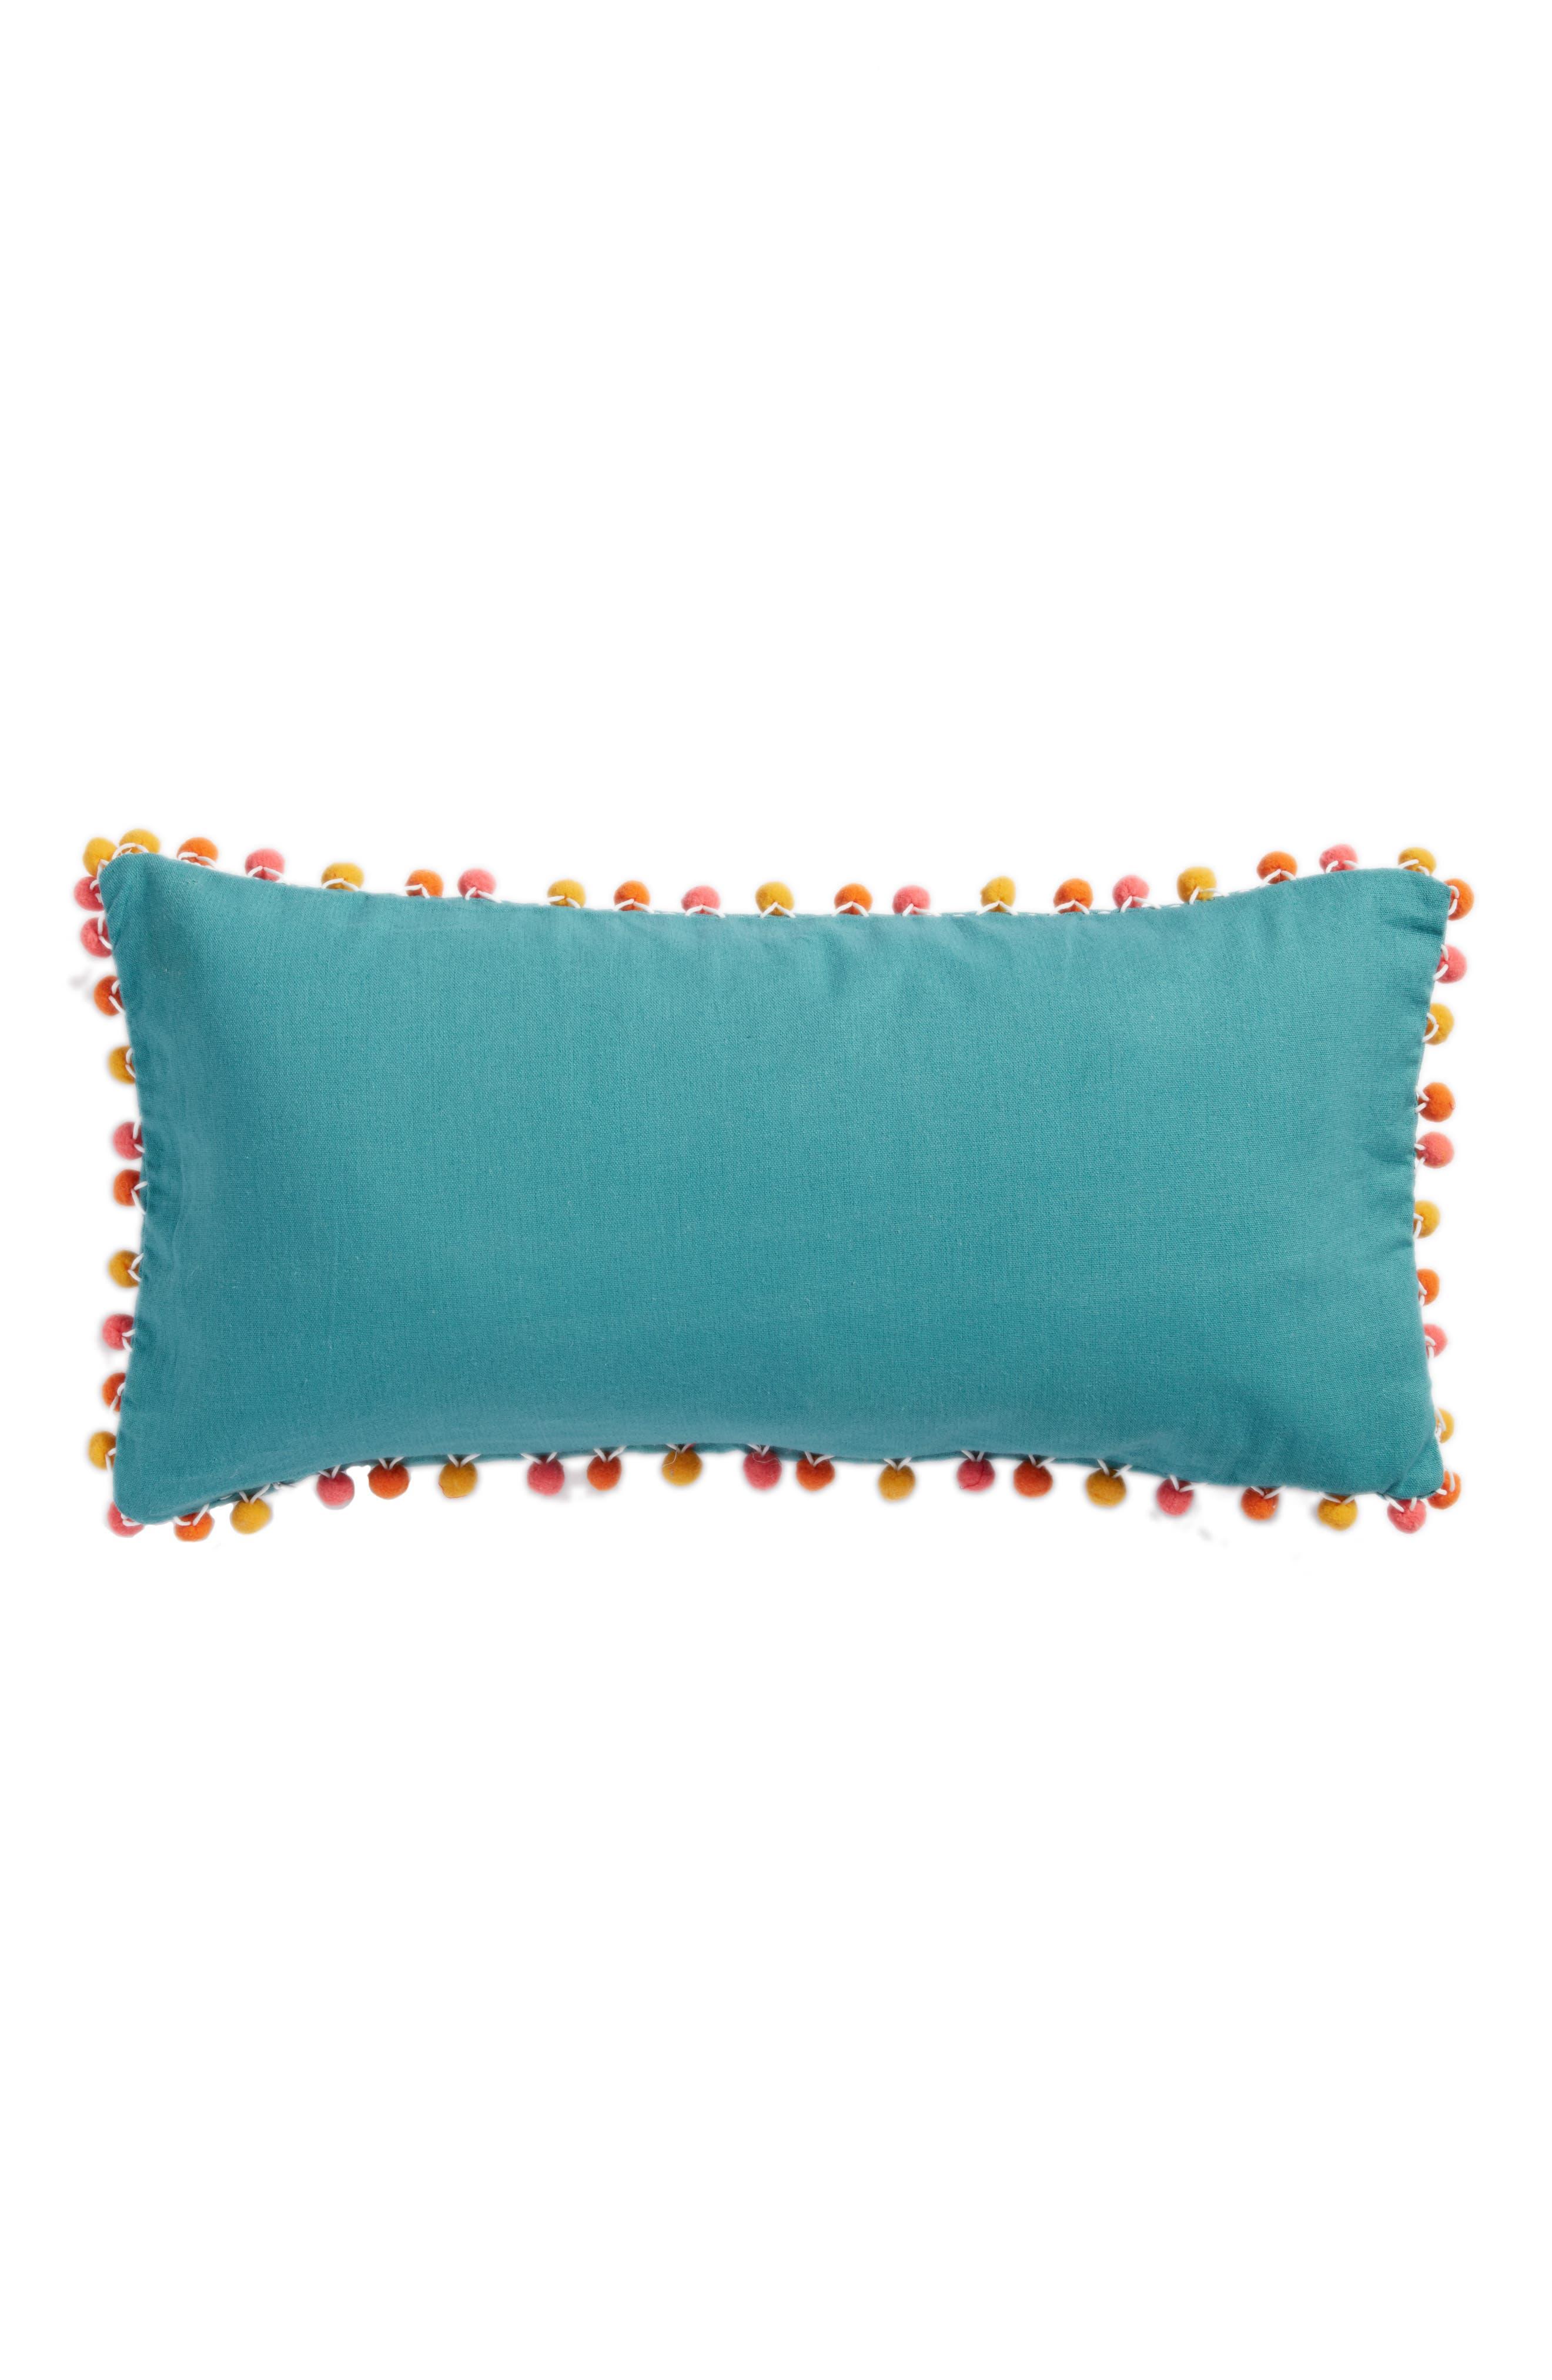 Carmen Staycation Accent Pillow,                             Alternate thumbnail 3, color,                             Blue